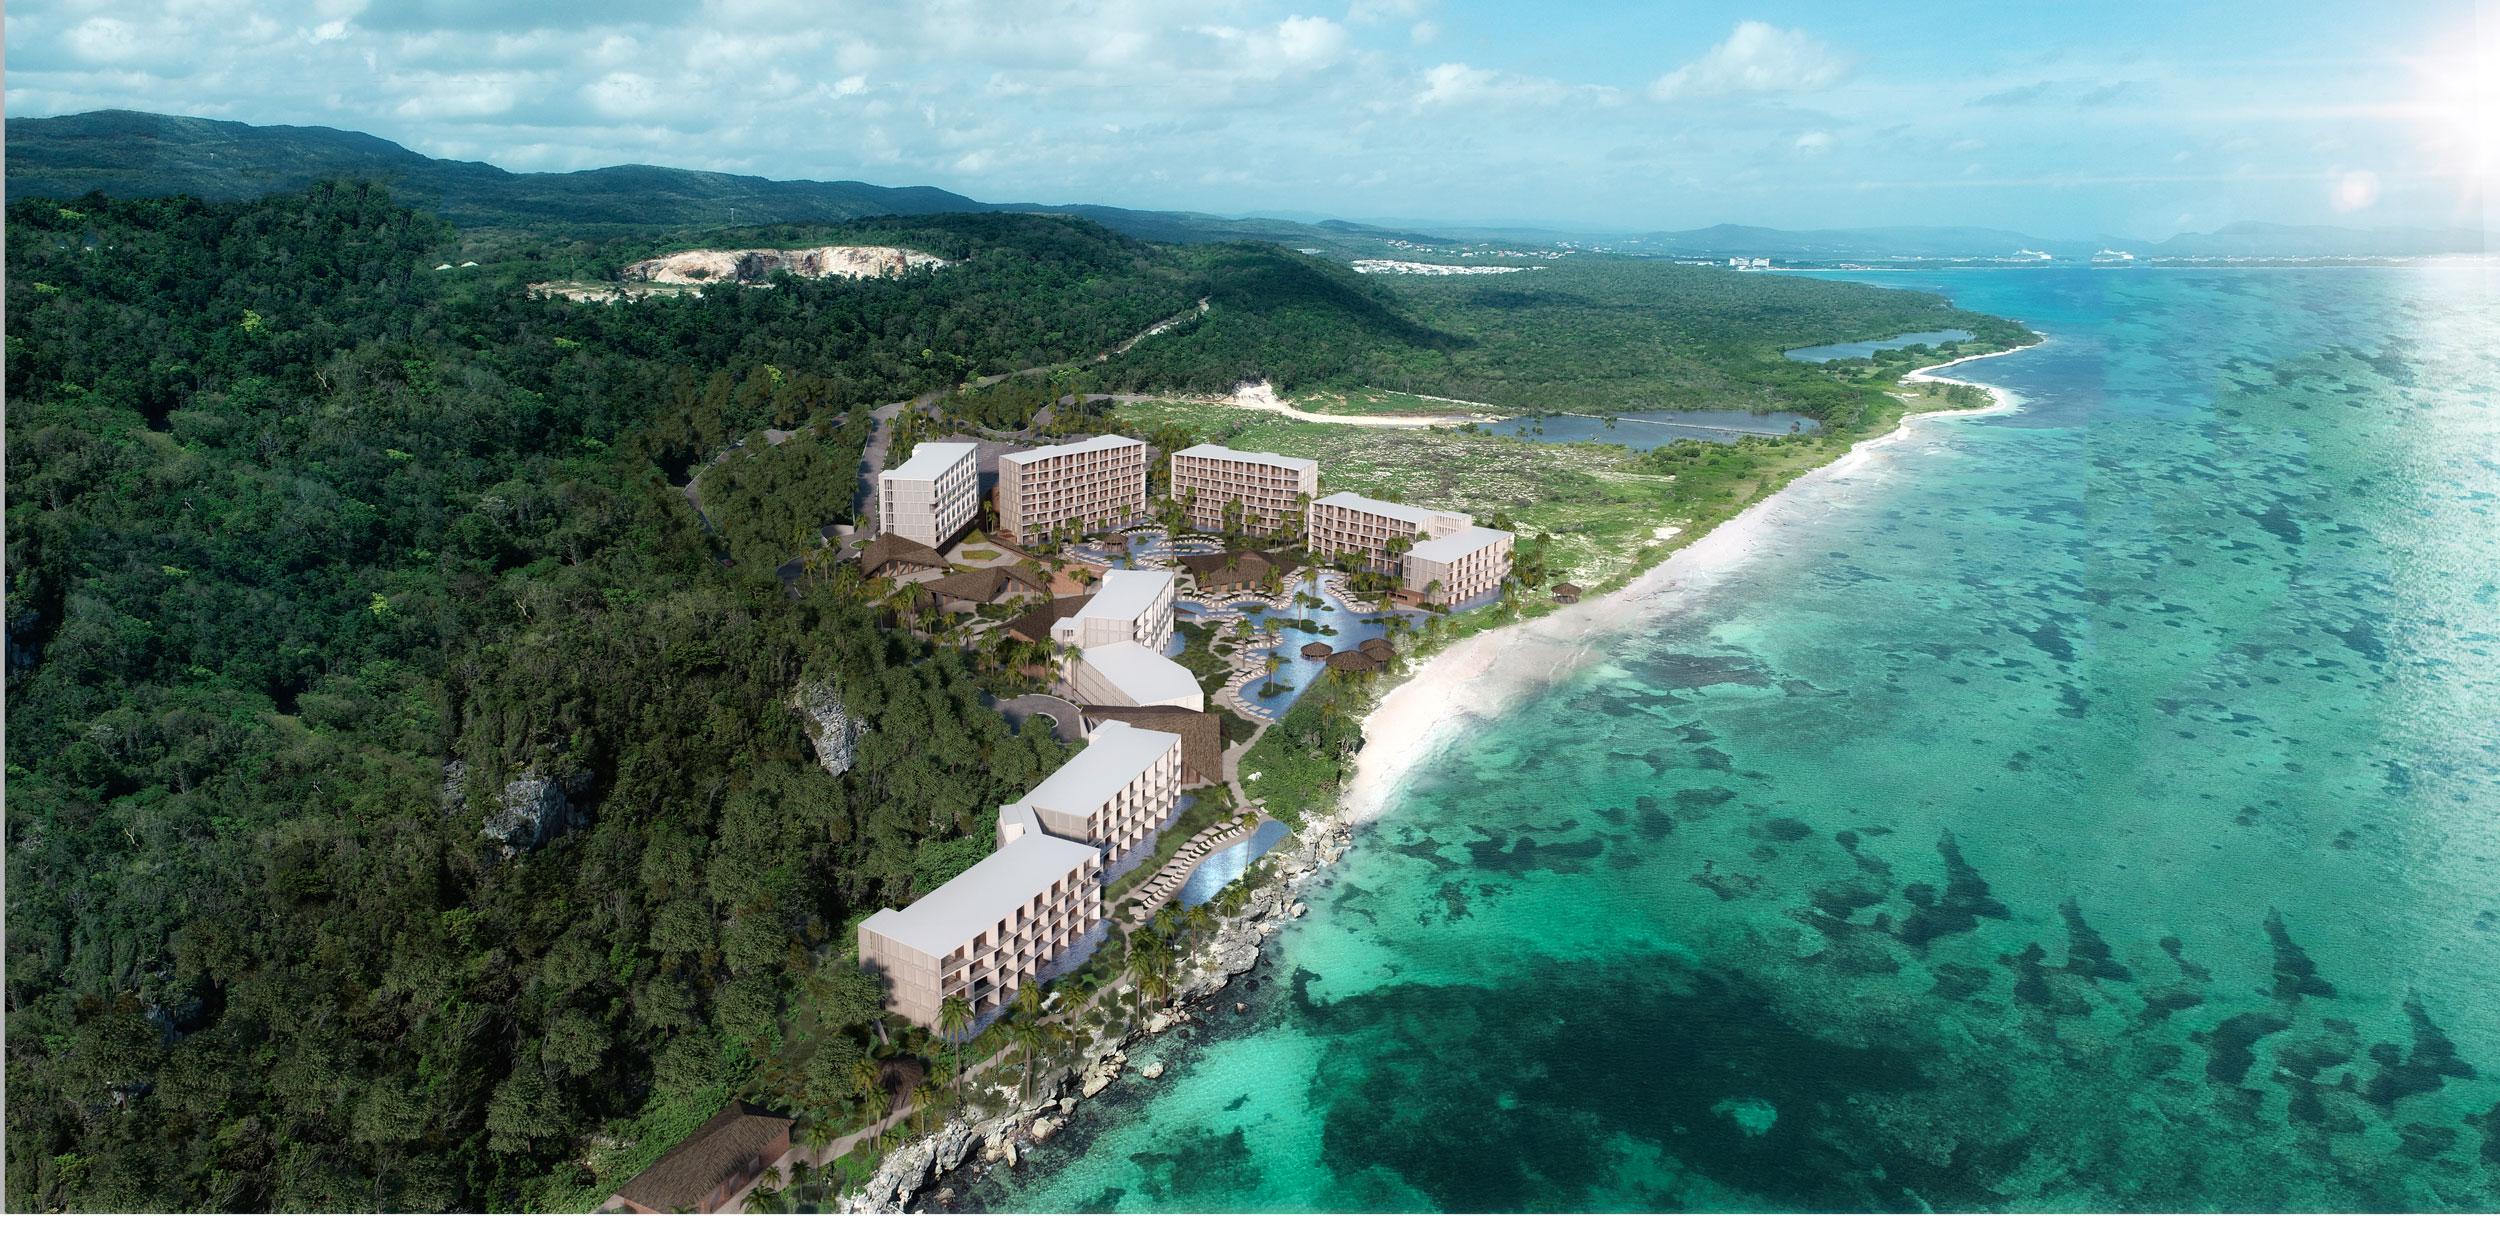 Vivid-Amaterra-Jamaica-(JW-Marriott)_Low_02